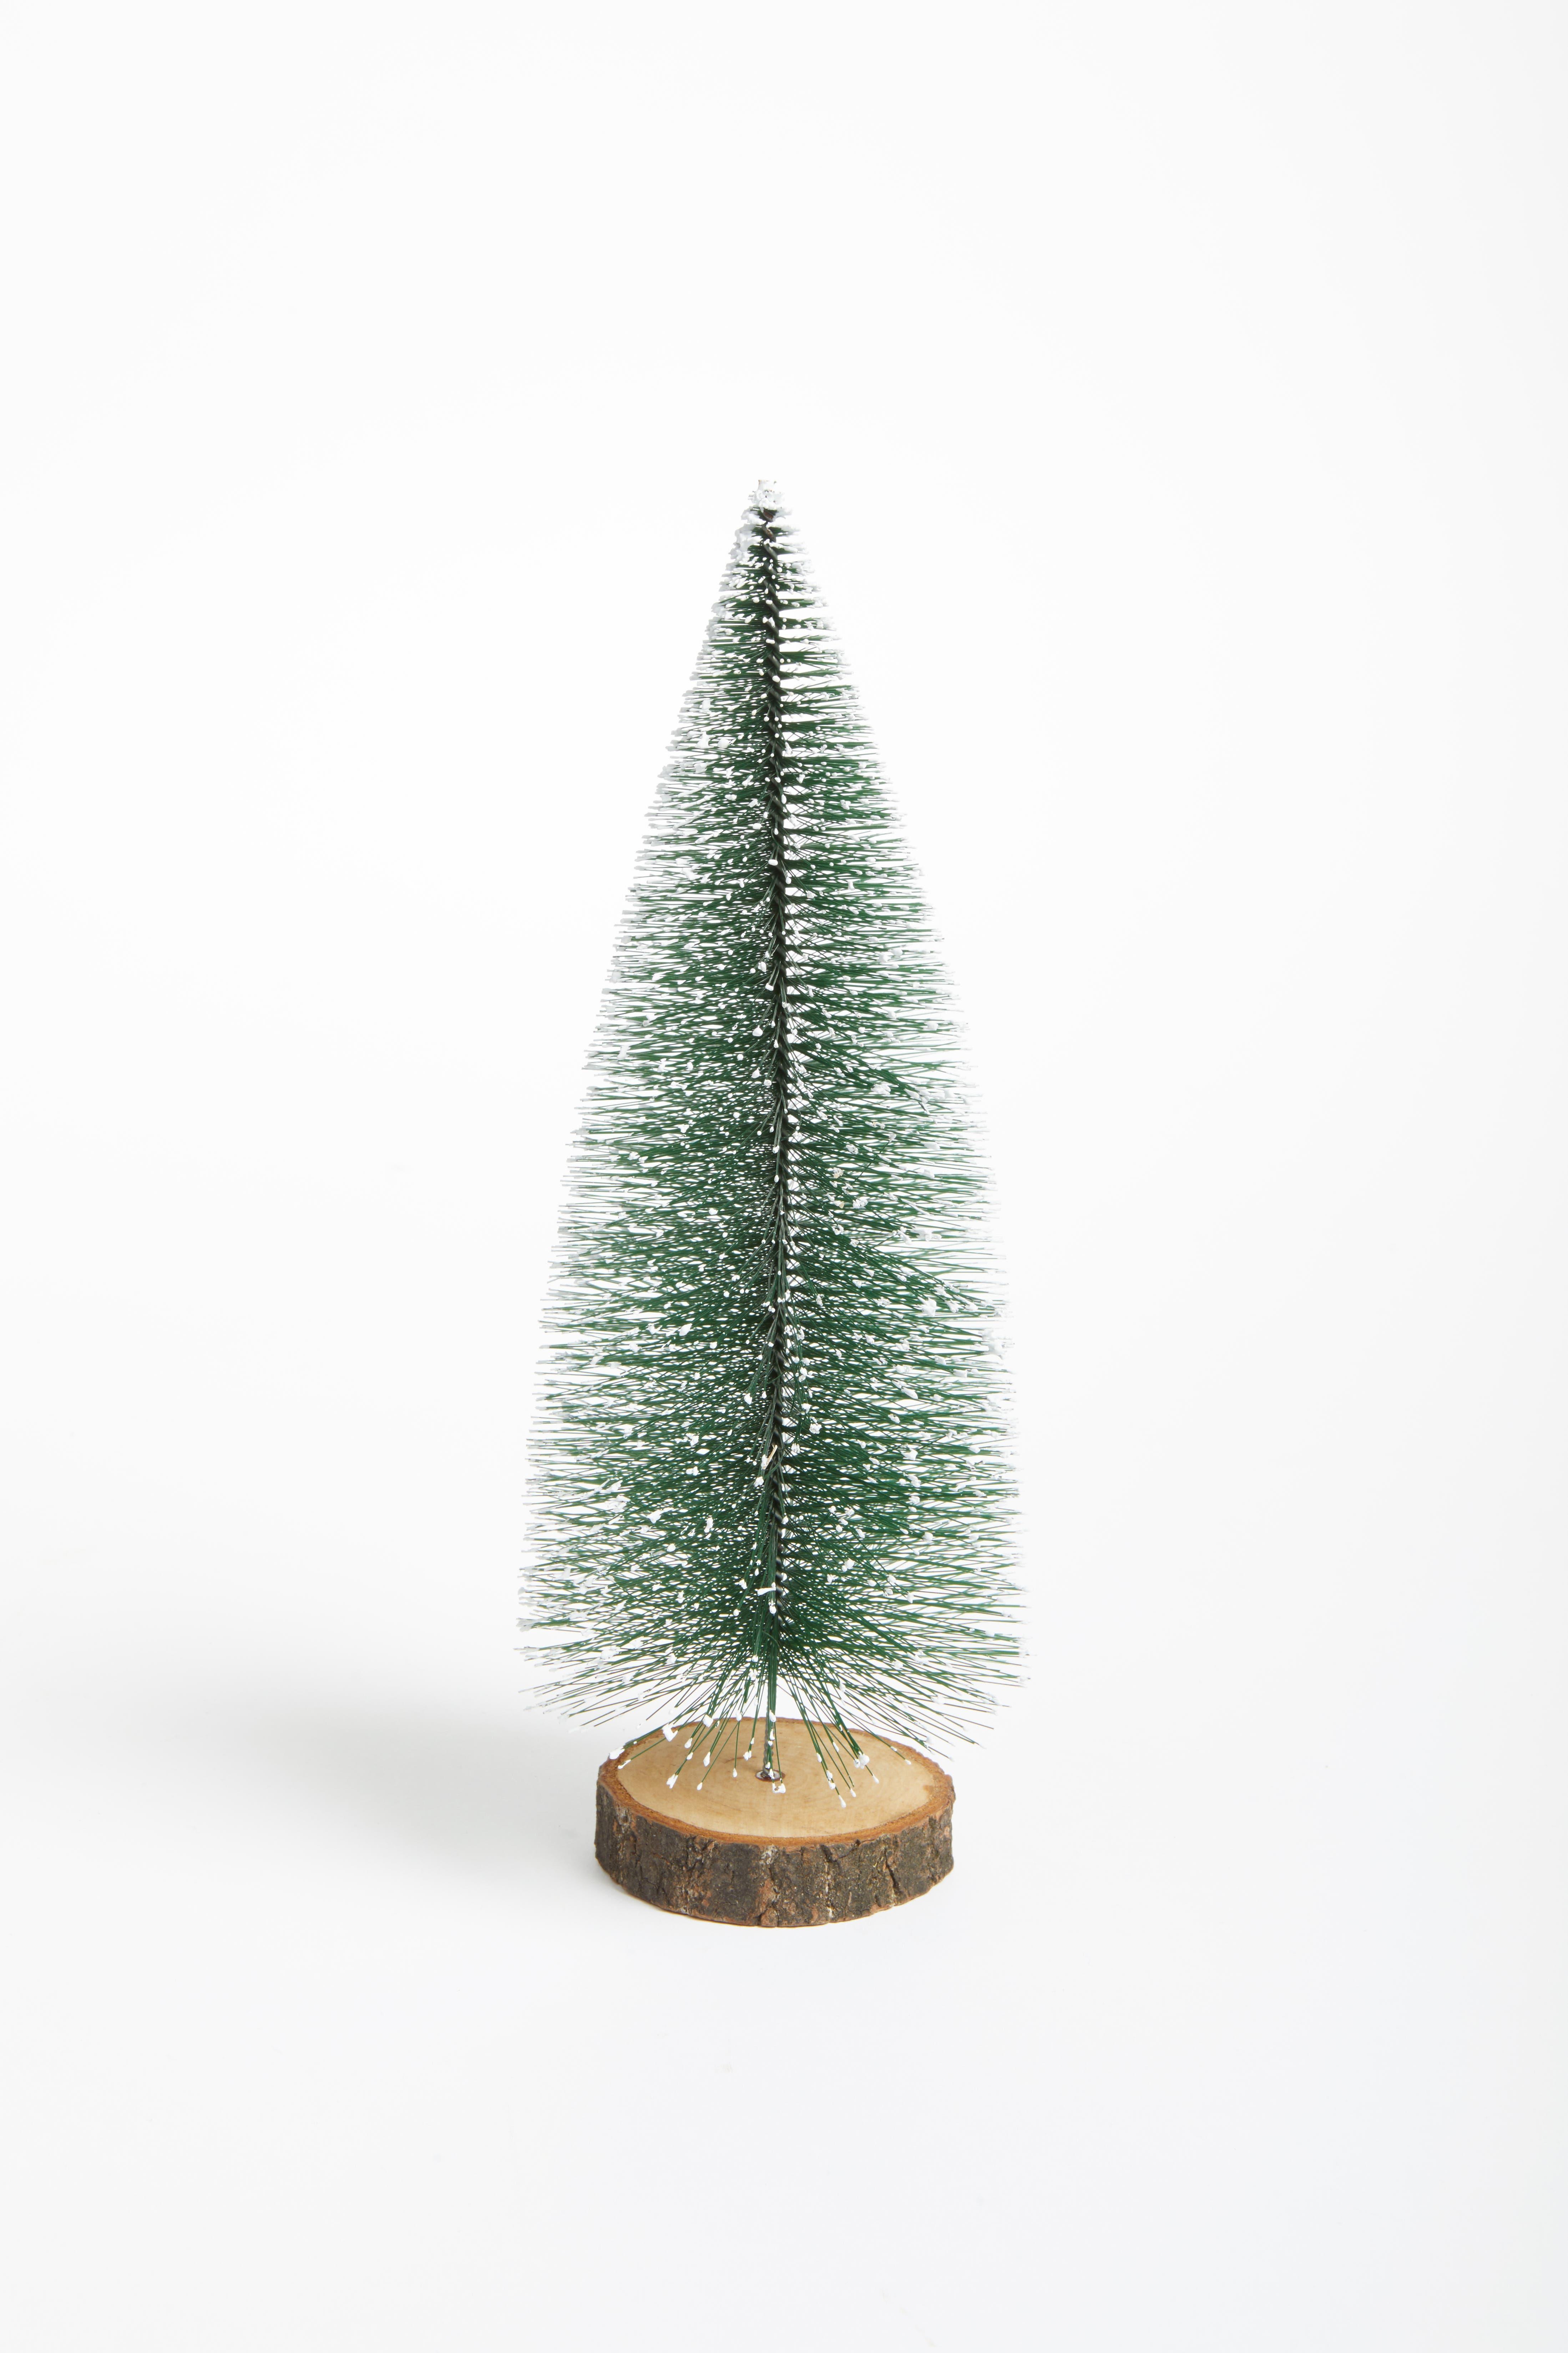 Alternate Image 1 Selected - Accent Decor Tall Bottle Brush Tree